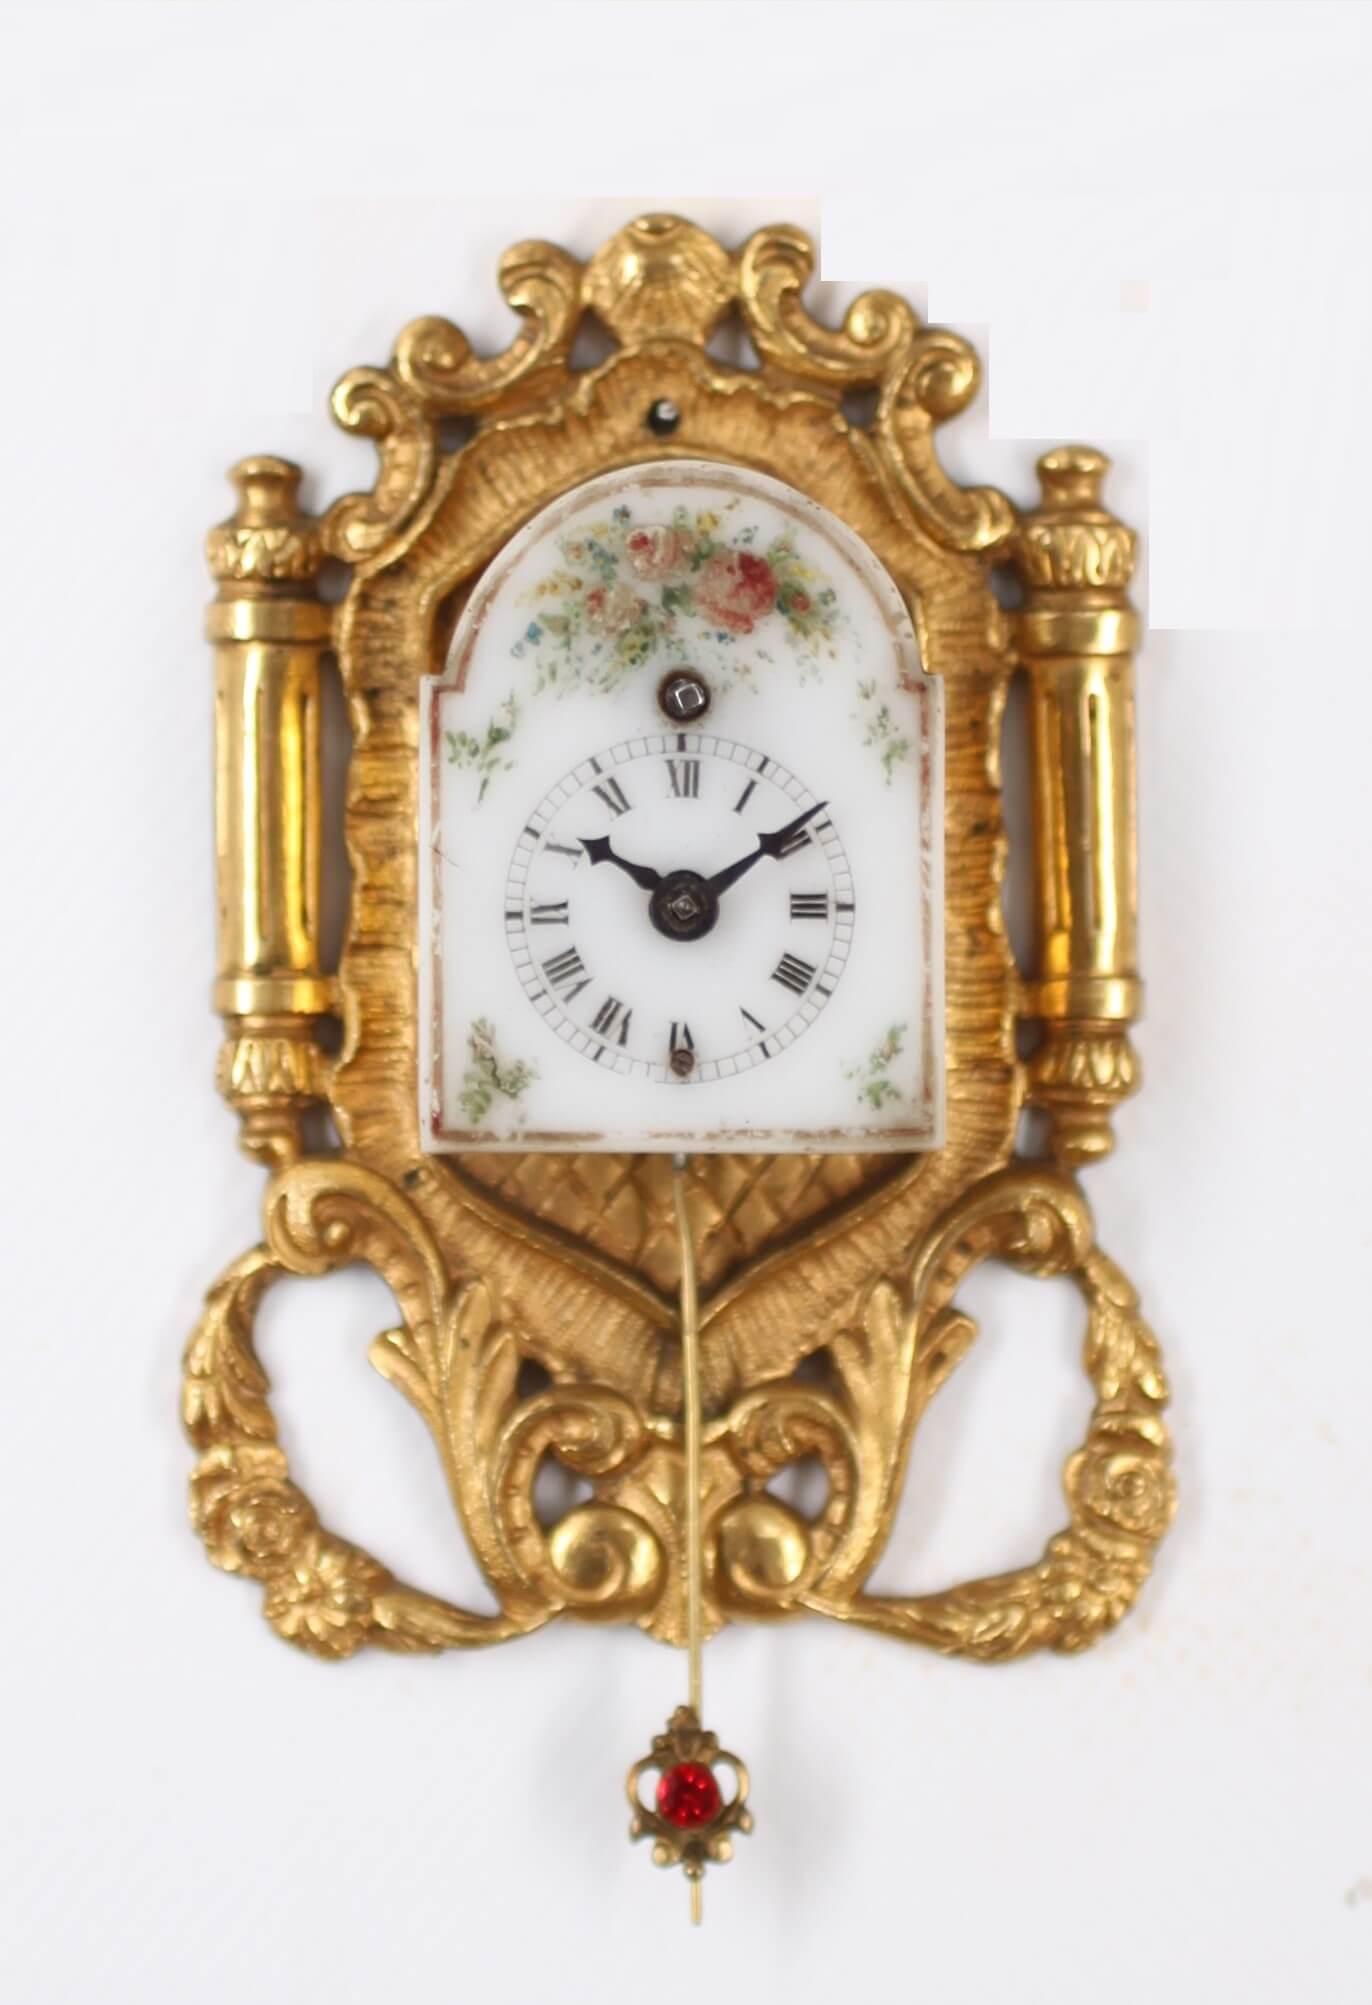 Miniature Vienna Ormolu Brettl Circa 1850